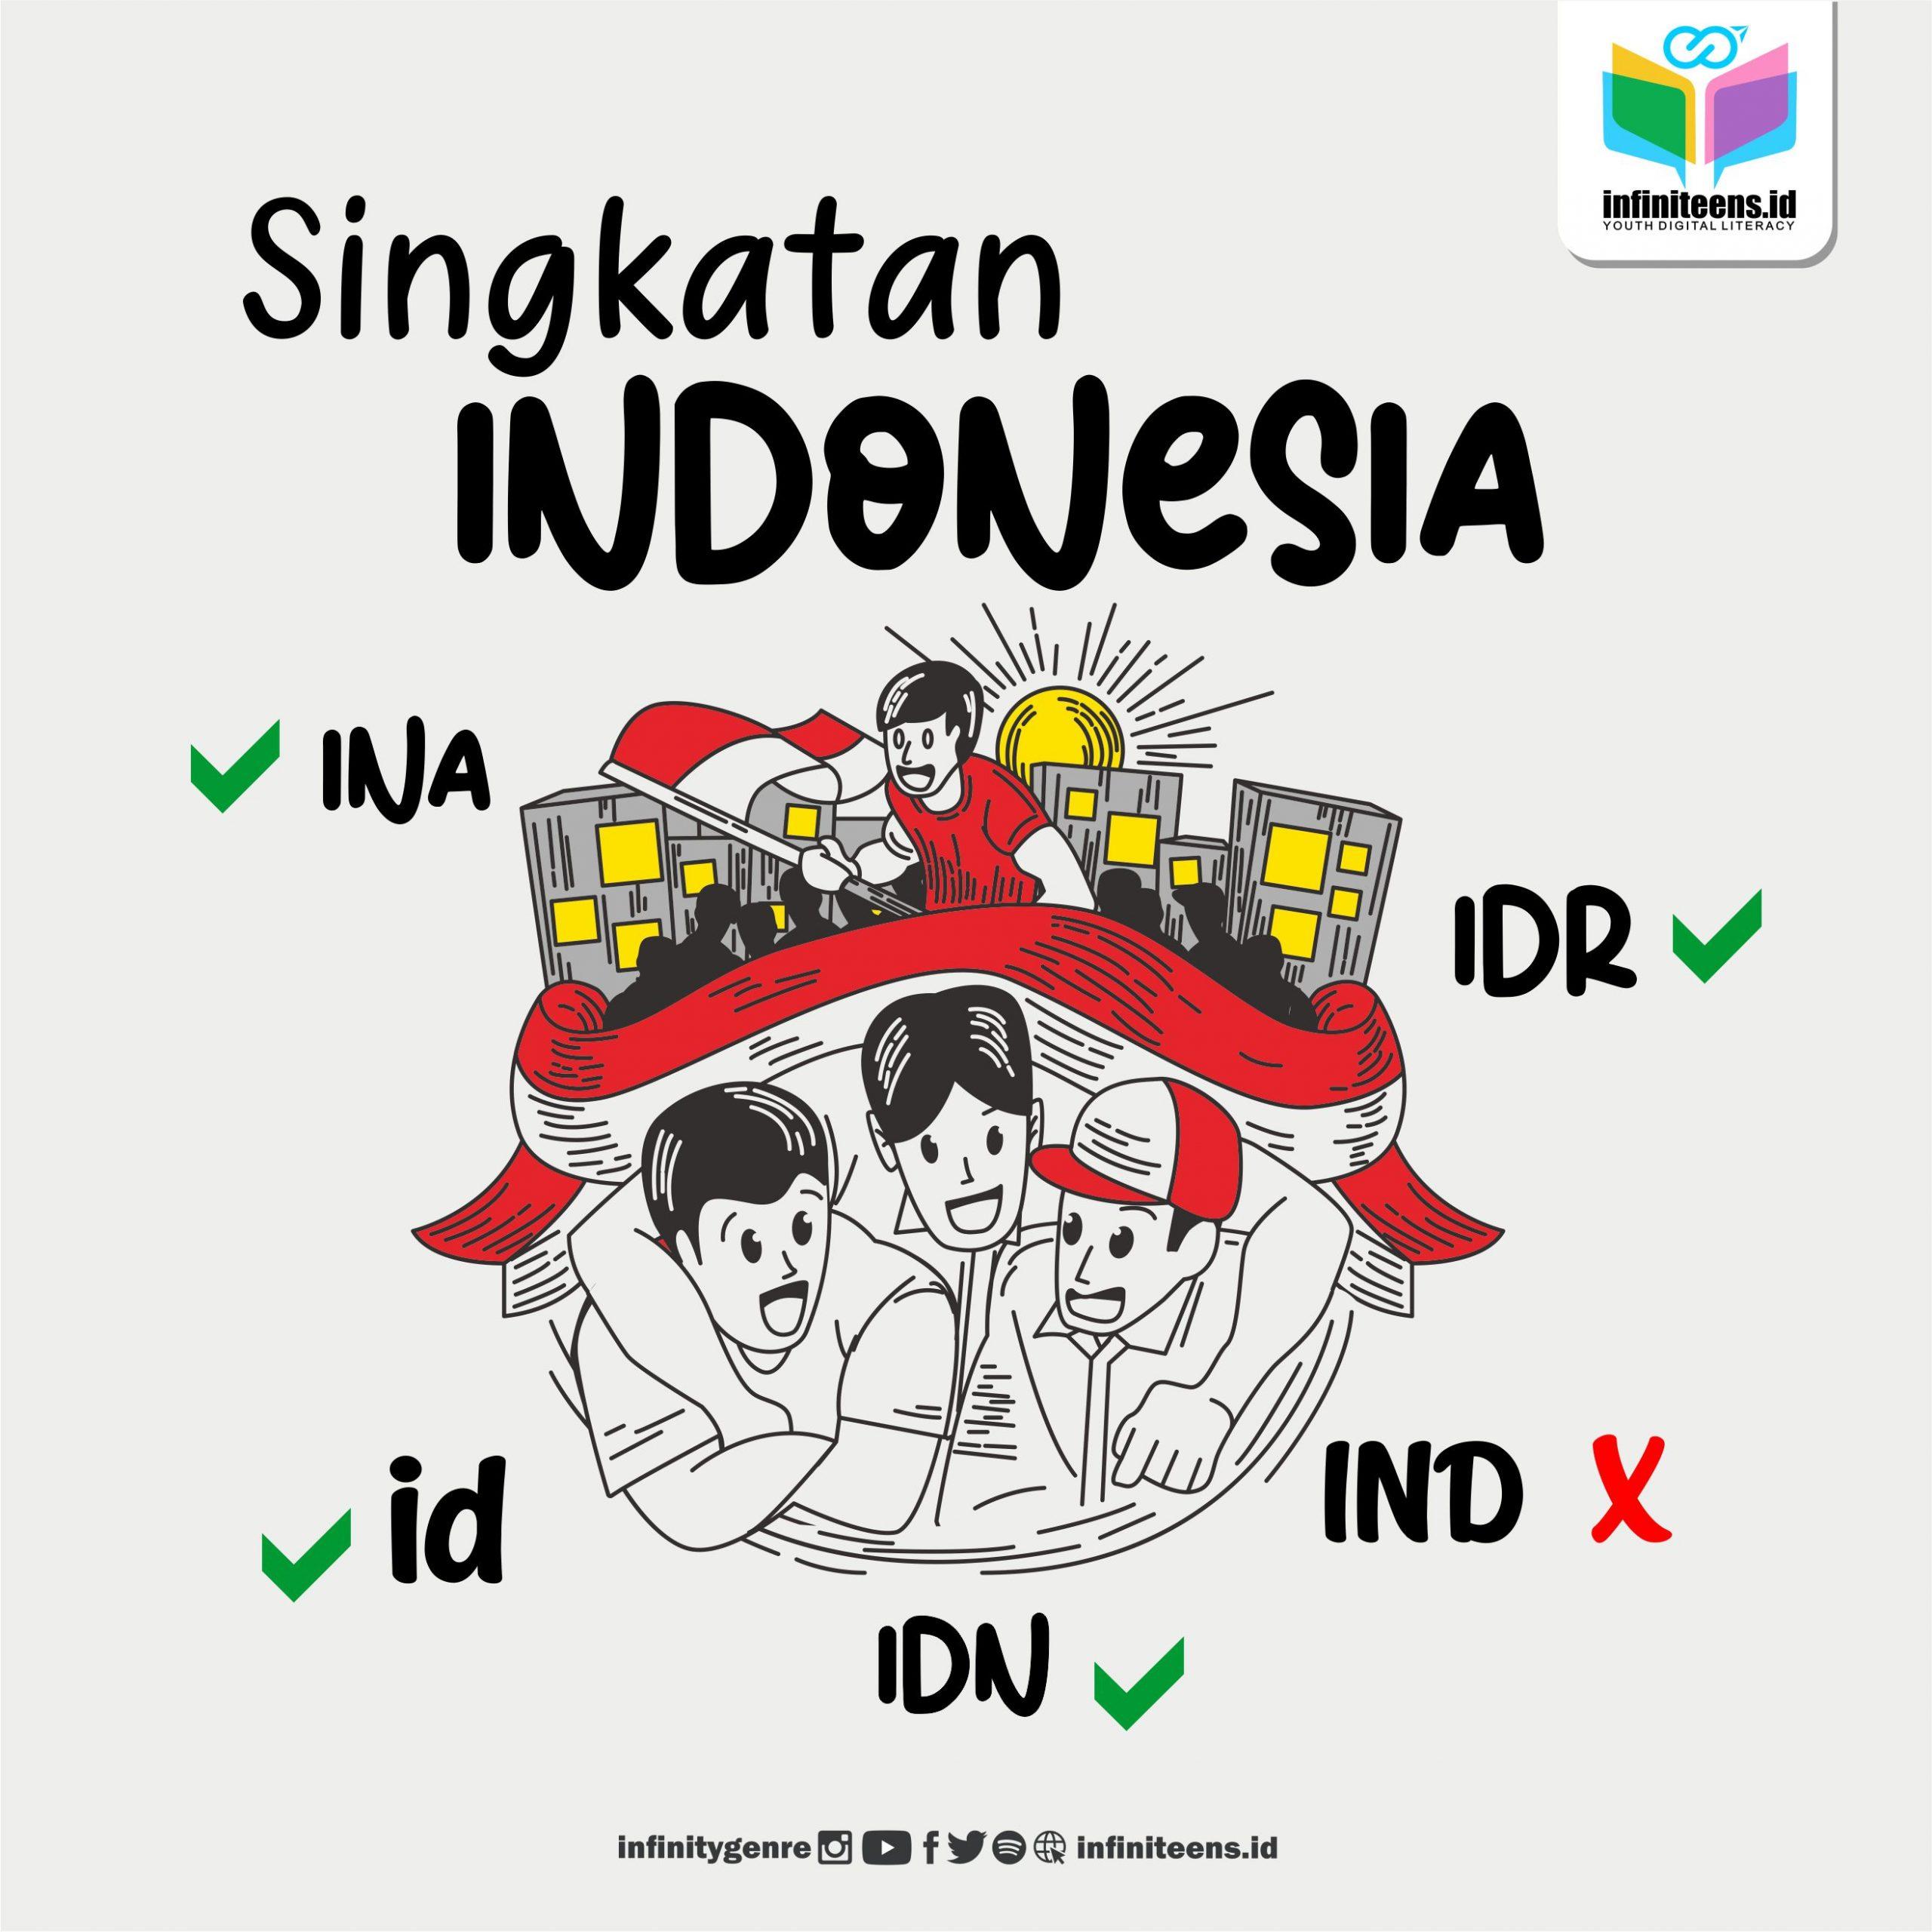 INDONESIA, Singkatan INA-IDN-ID-IDR Gimana Penggunaannya?